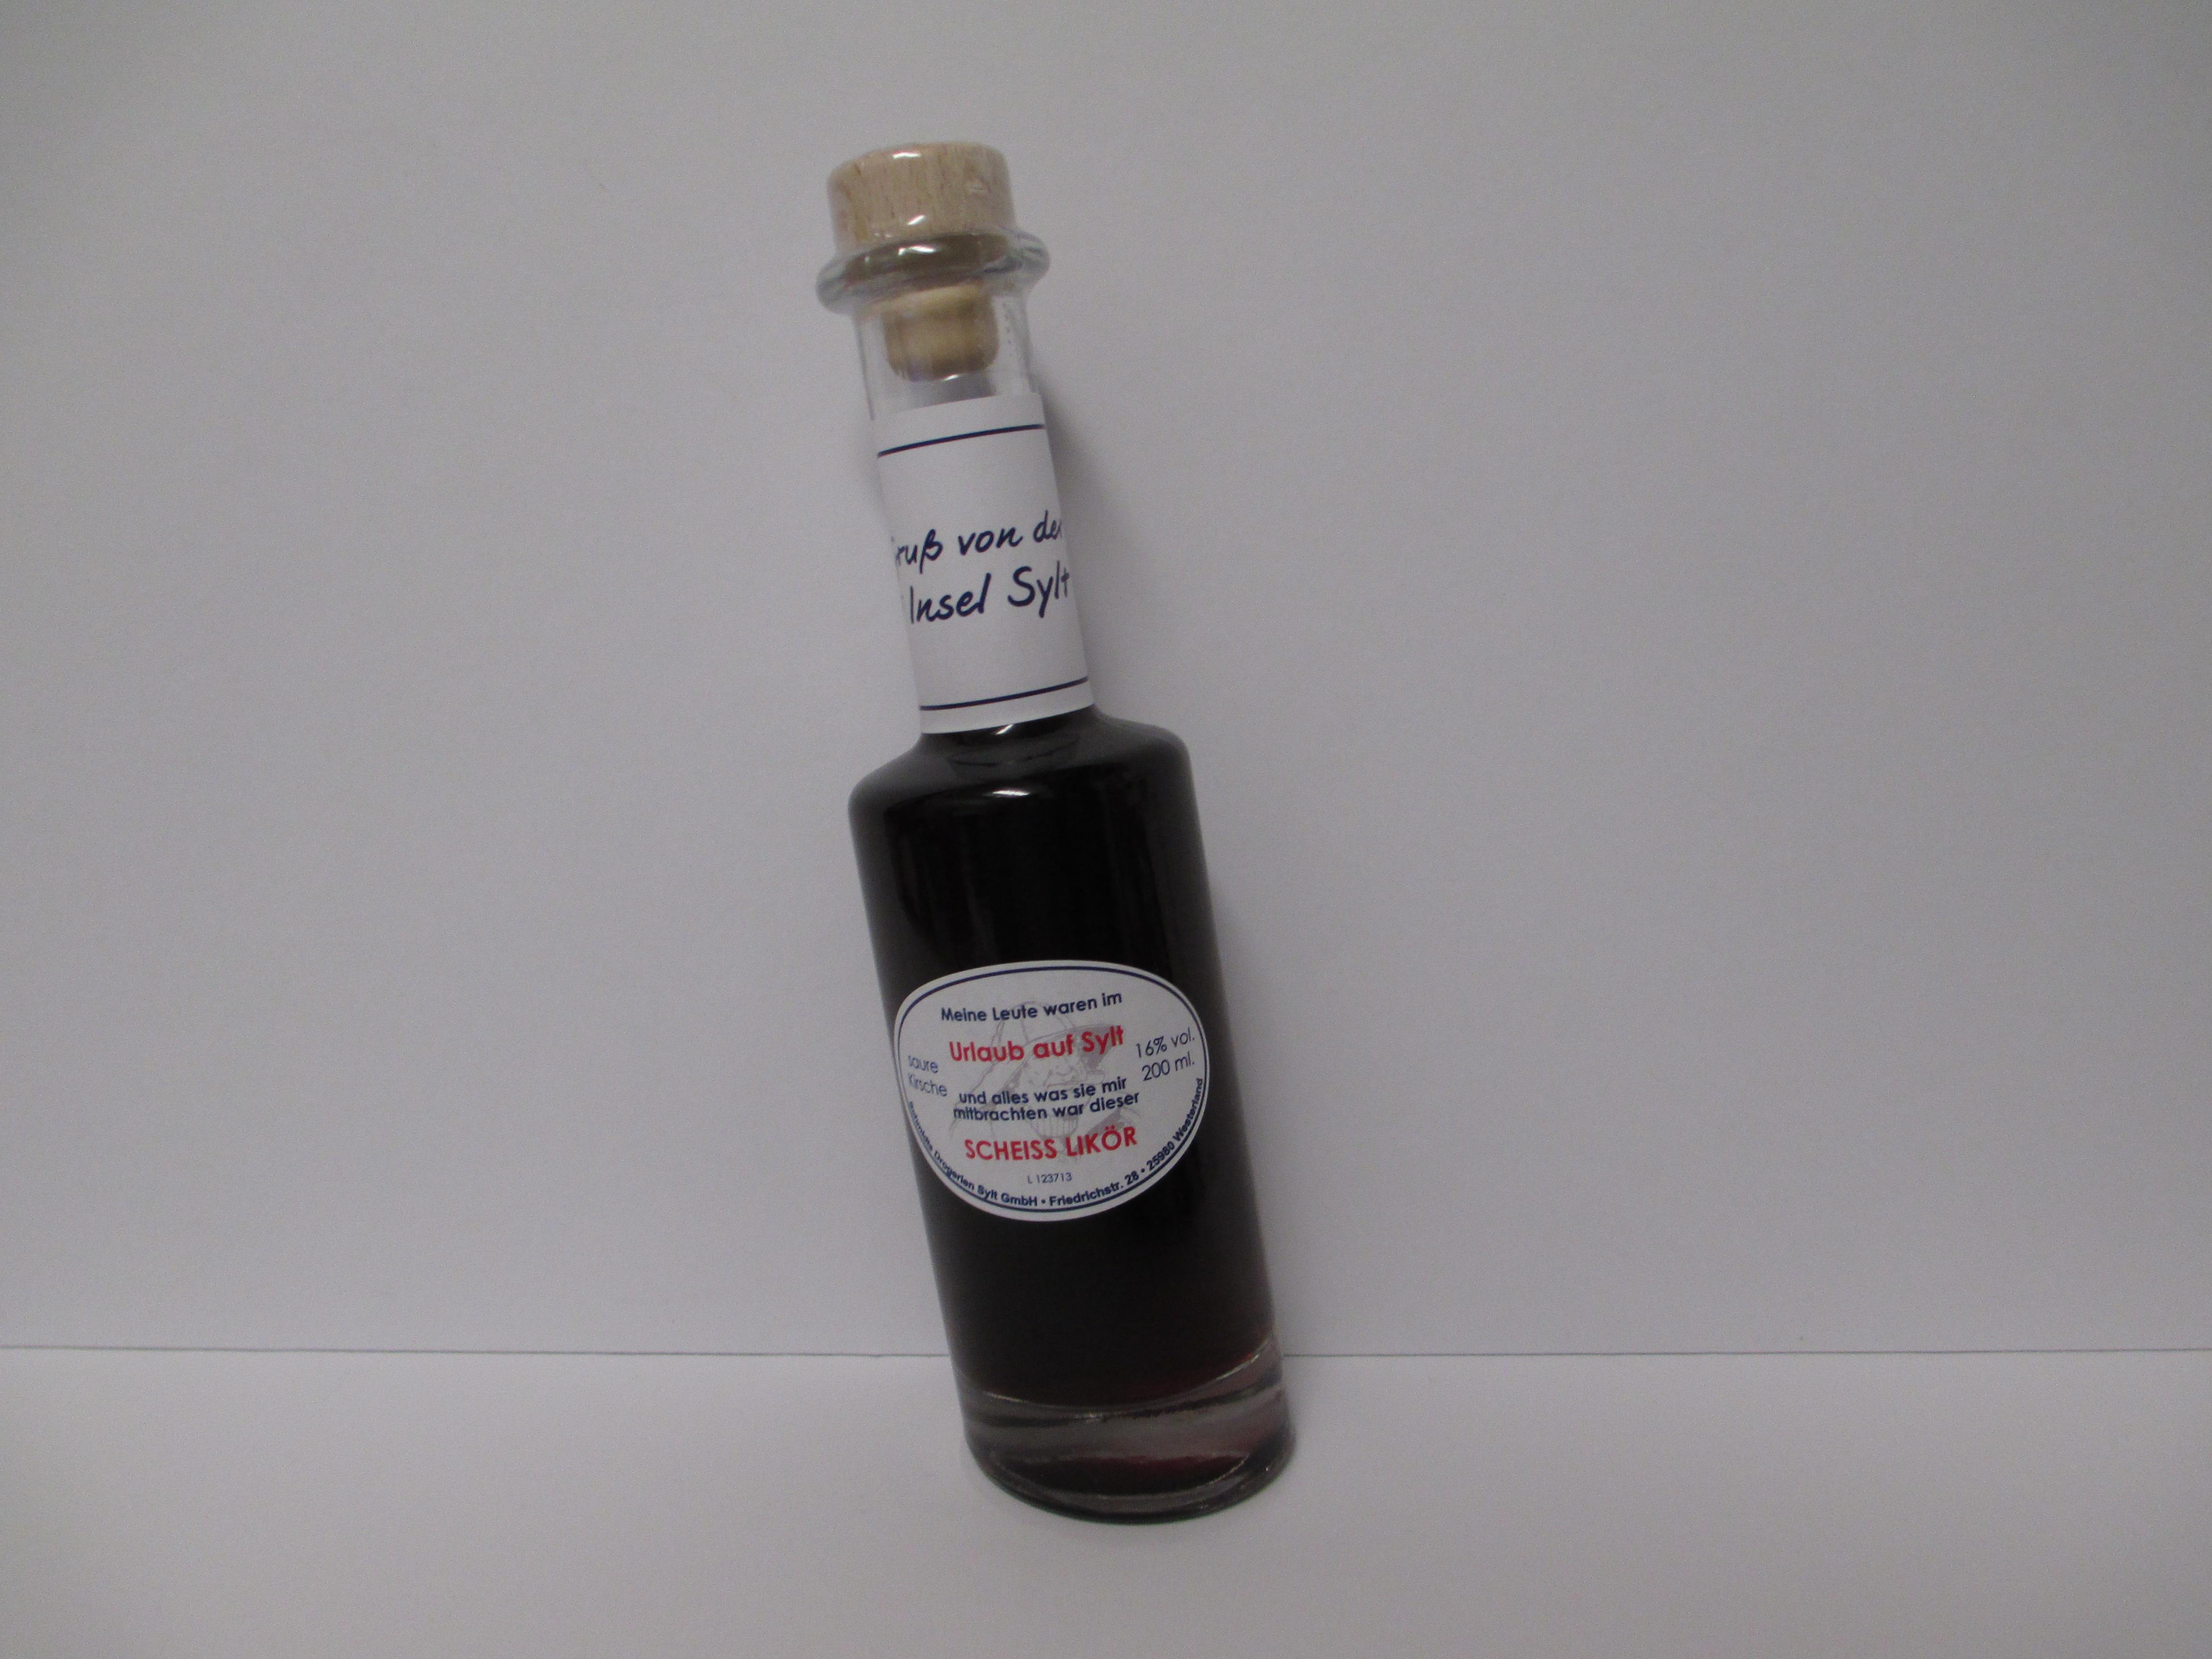 bounty flaschen 200ml spirituosen schmidts drogerien. Black Bedroom Furniture Sets. Home Design Ideas